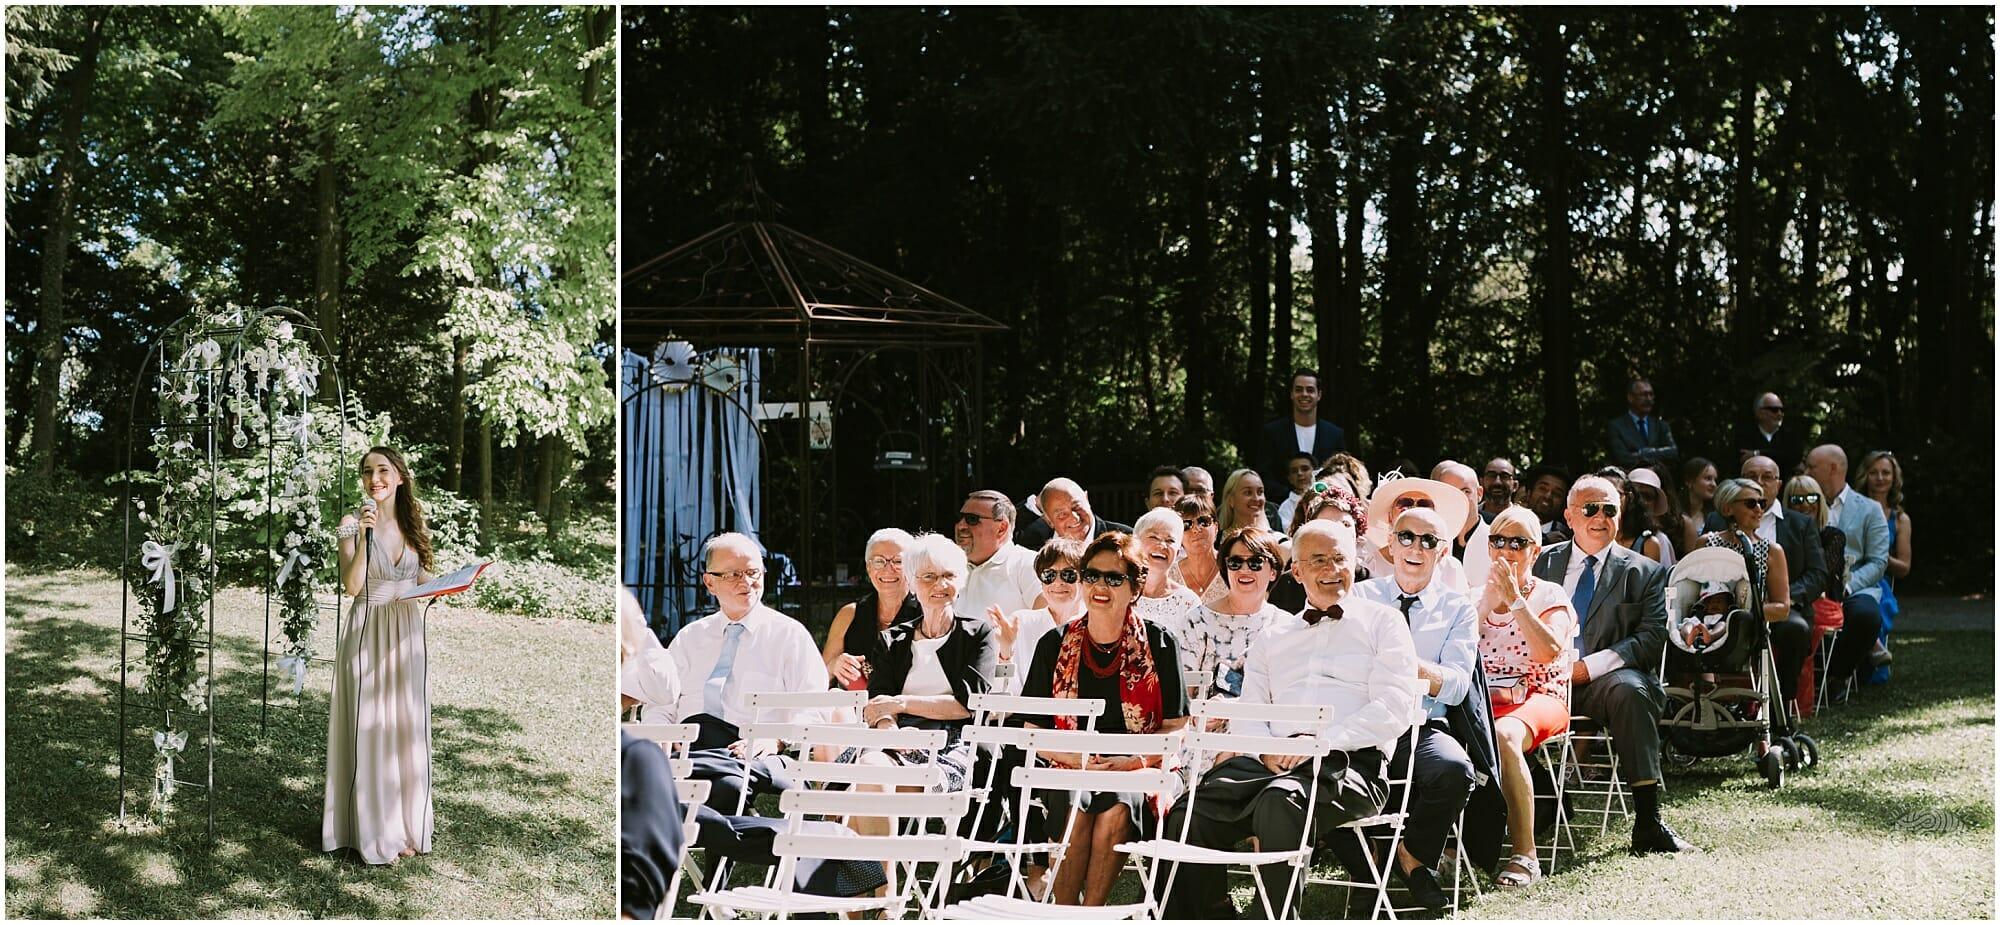 Kateryna-photos-photographe-mariage-chateau-des-3-fontaines-provence-avignon-vaucluse-sud_0036.jpg